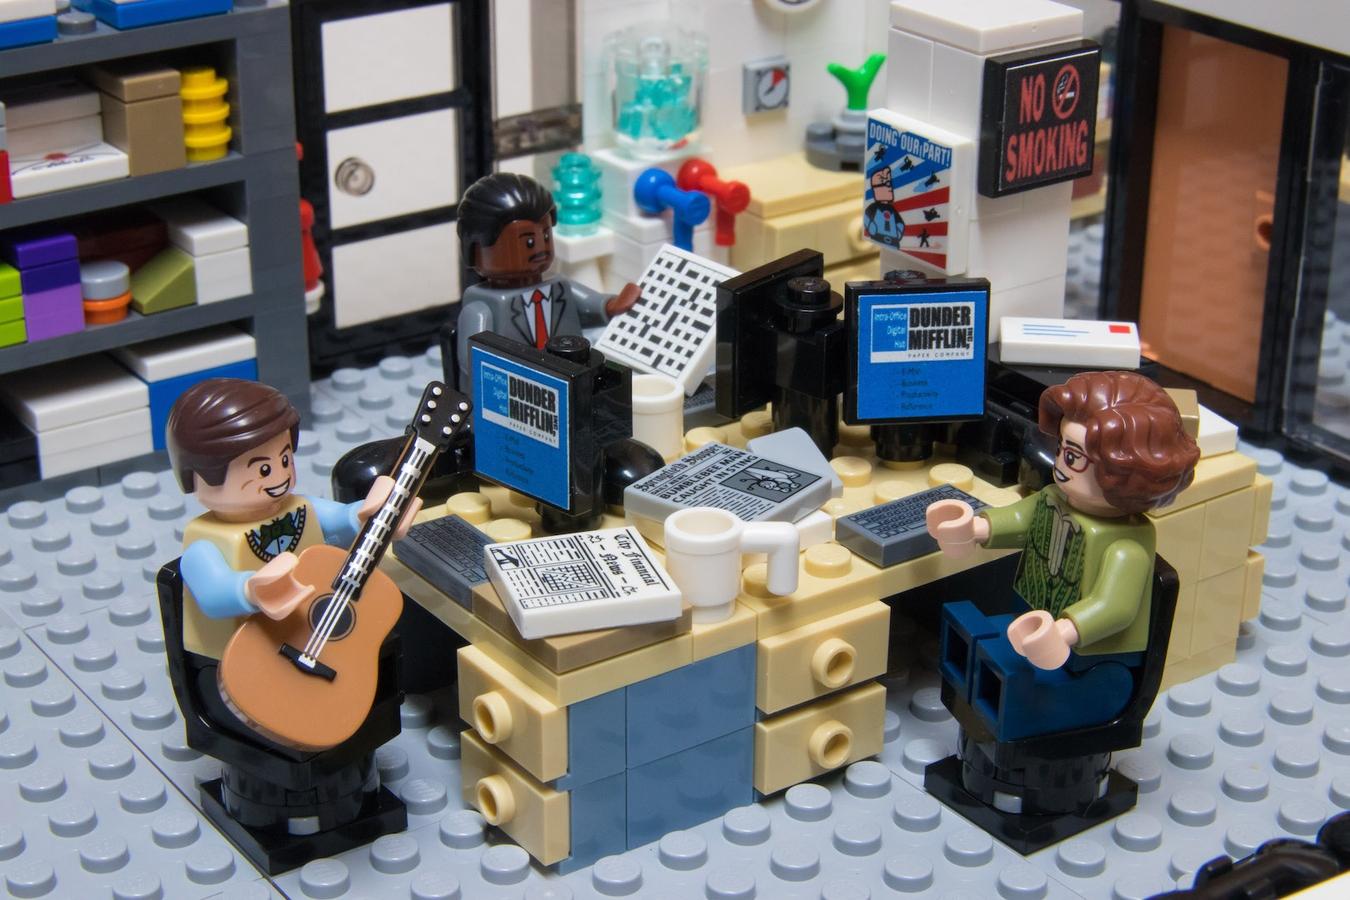 lego-the-office-buero-gitarre zusammengebaut.com